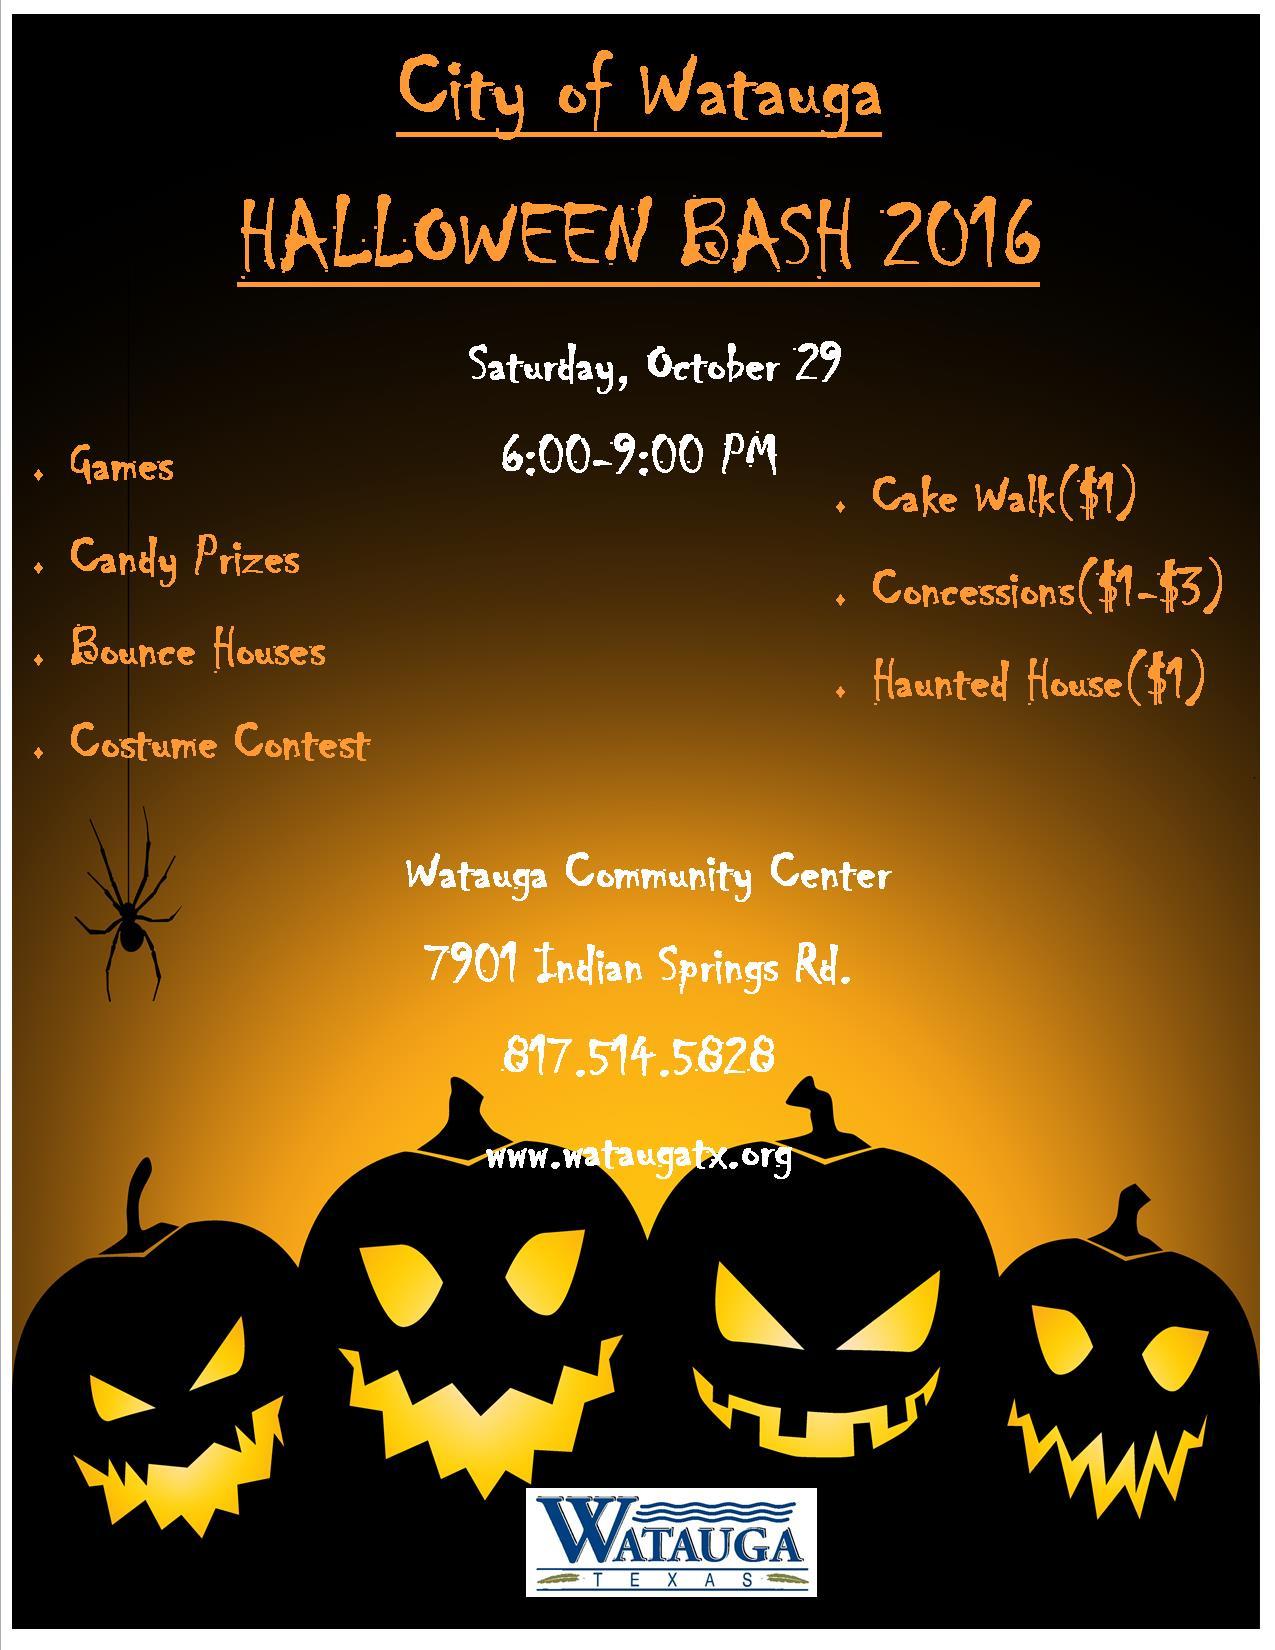 Wataugas Halloween Bash 2020, October 27 Watauga, TX   Official Website